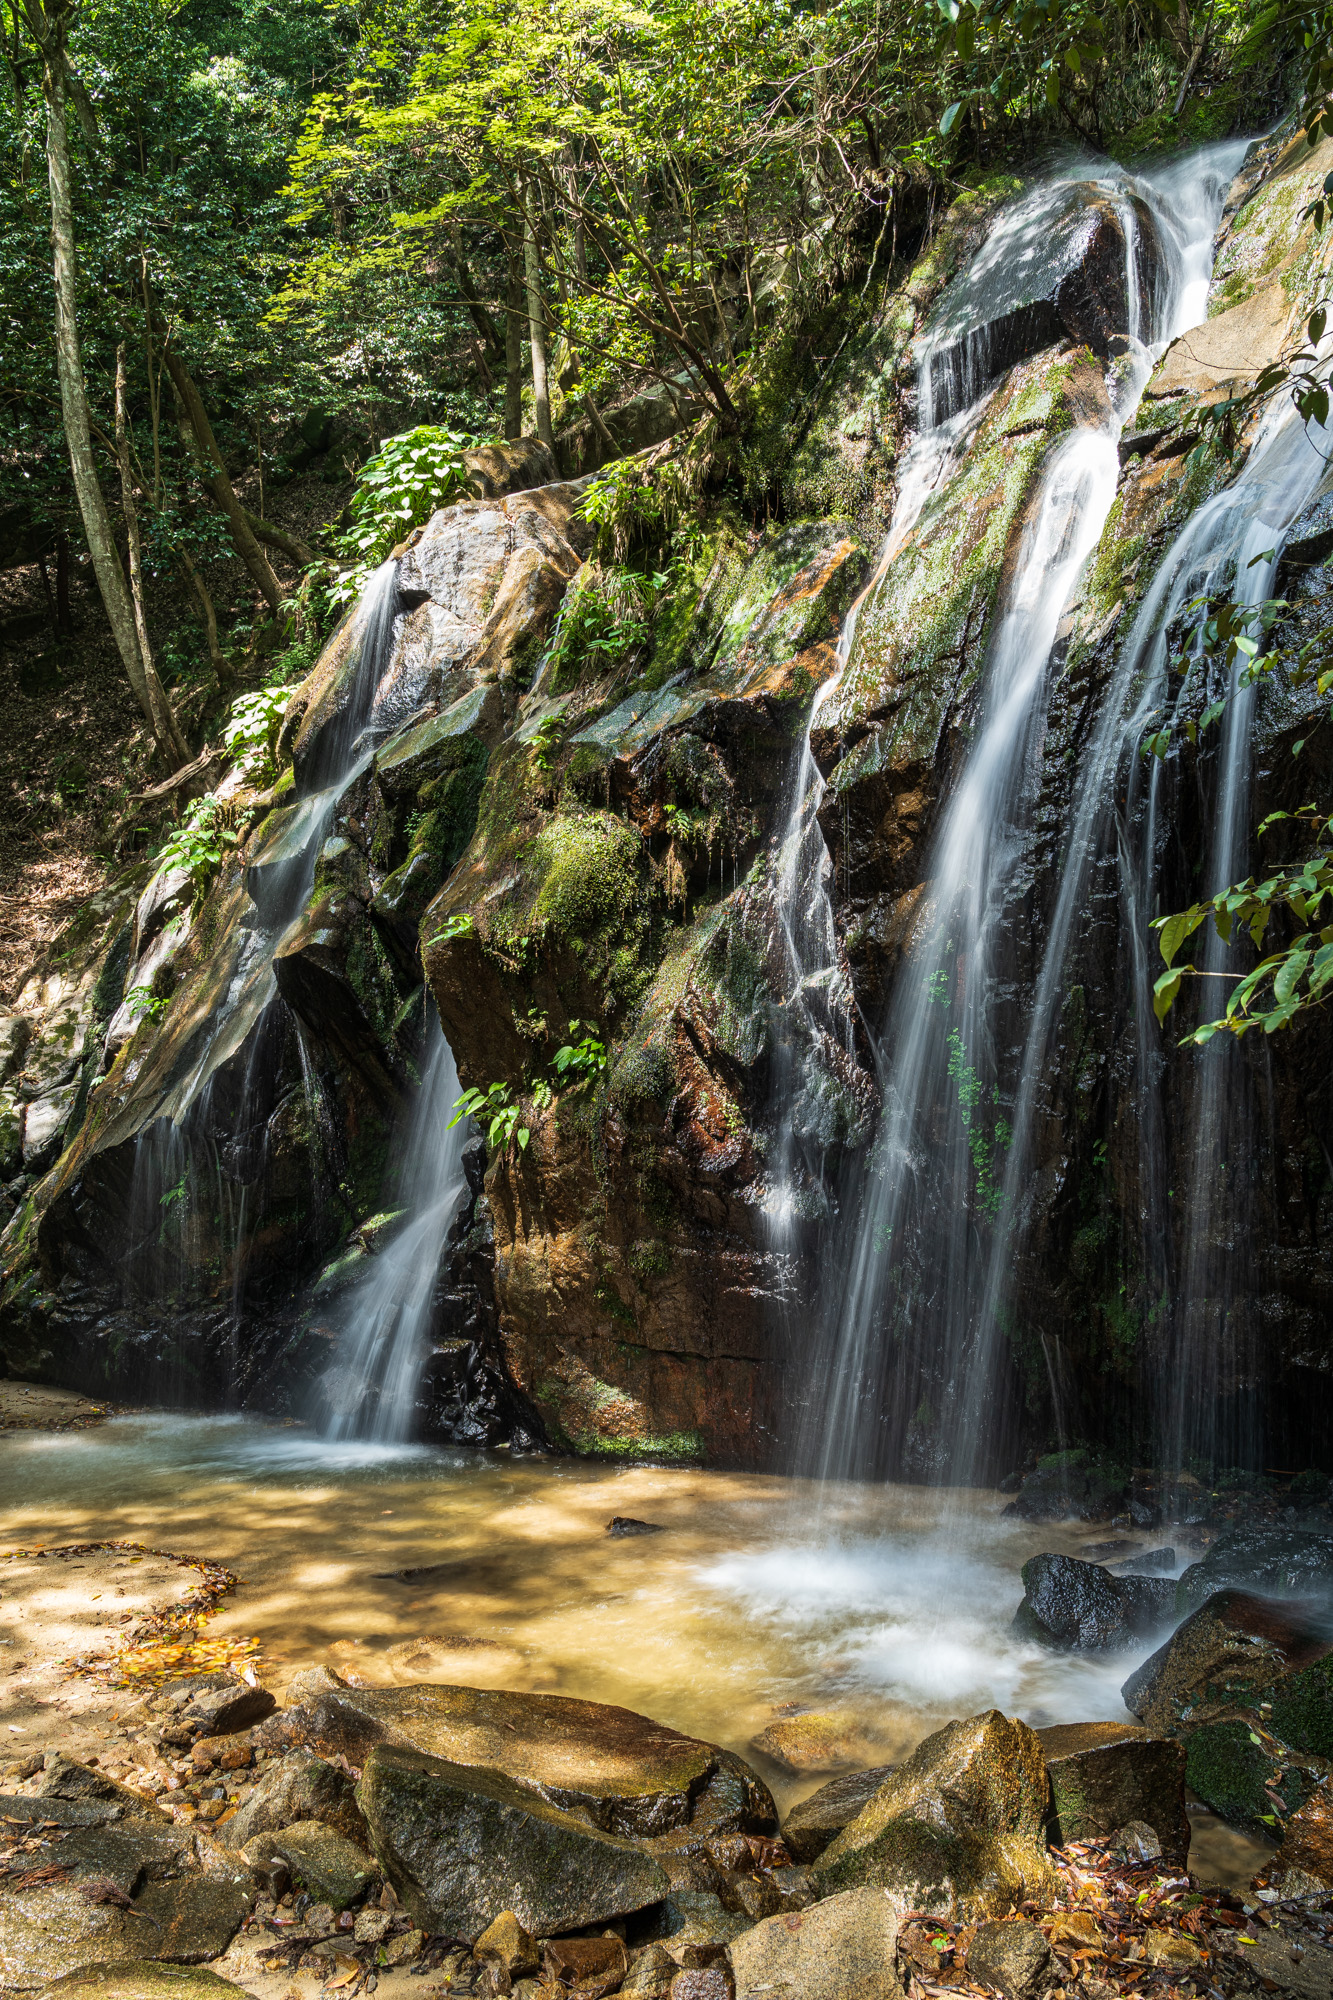 DSC04578-Edit 京都  金引の滝 ( 京都の夏、新緑の時期におすすめの滝写真スポット・アクセス情報や撮影ポイントなど!)